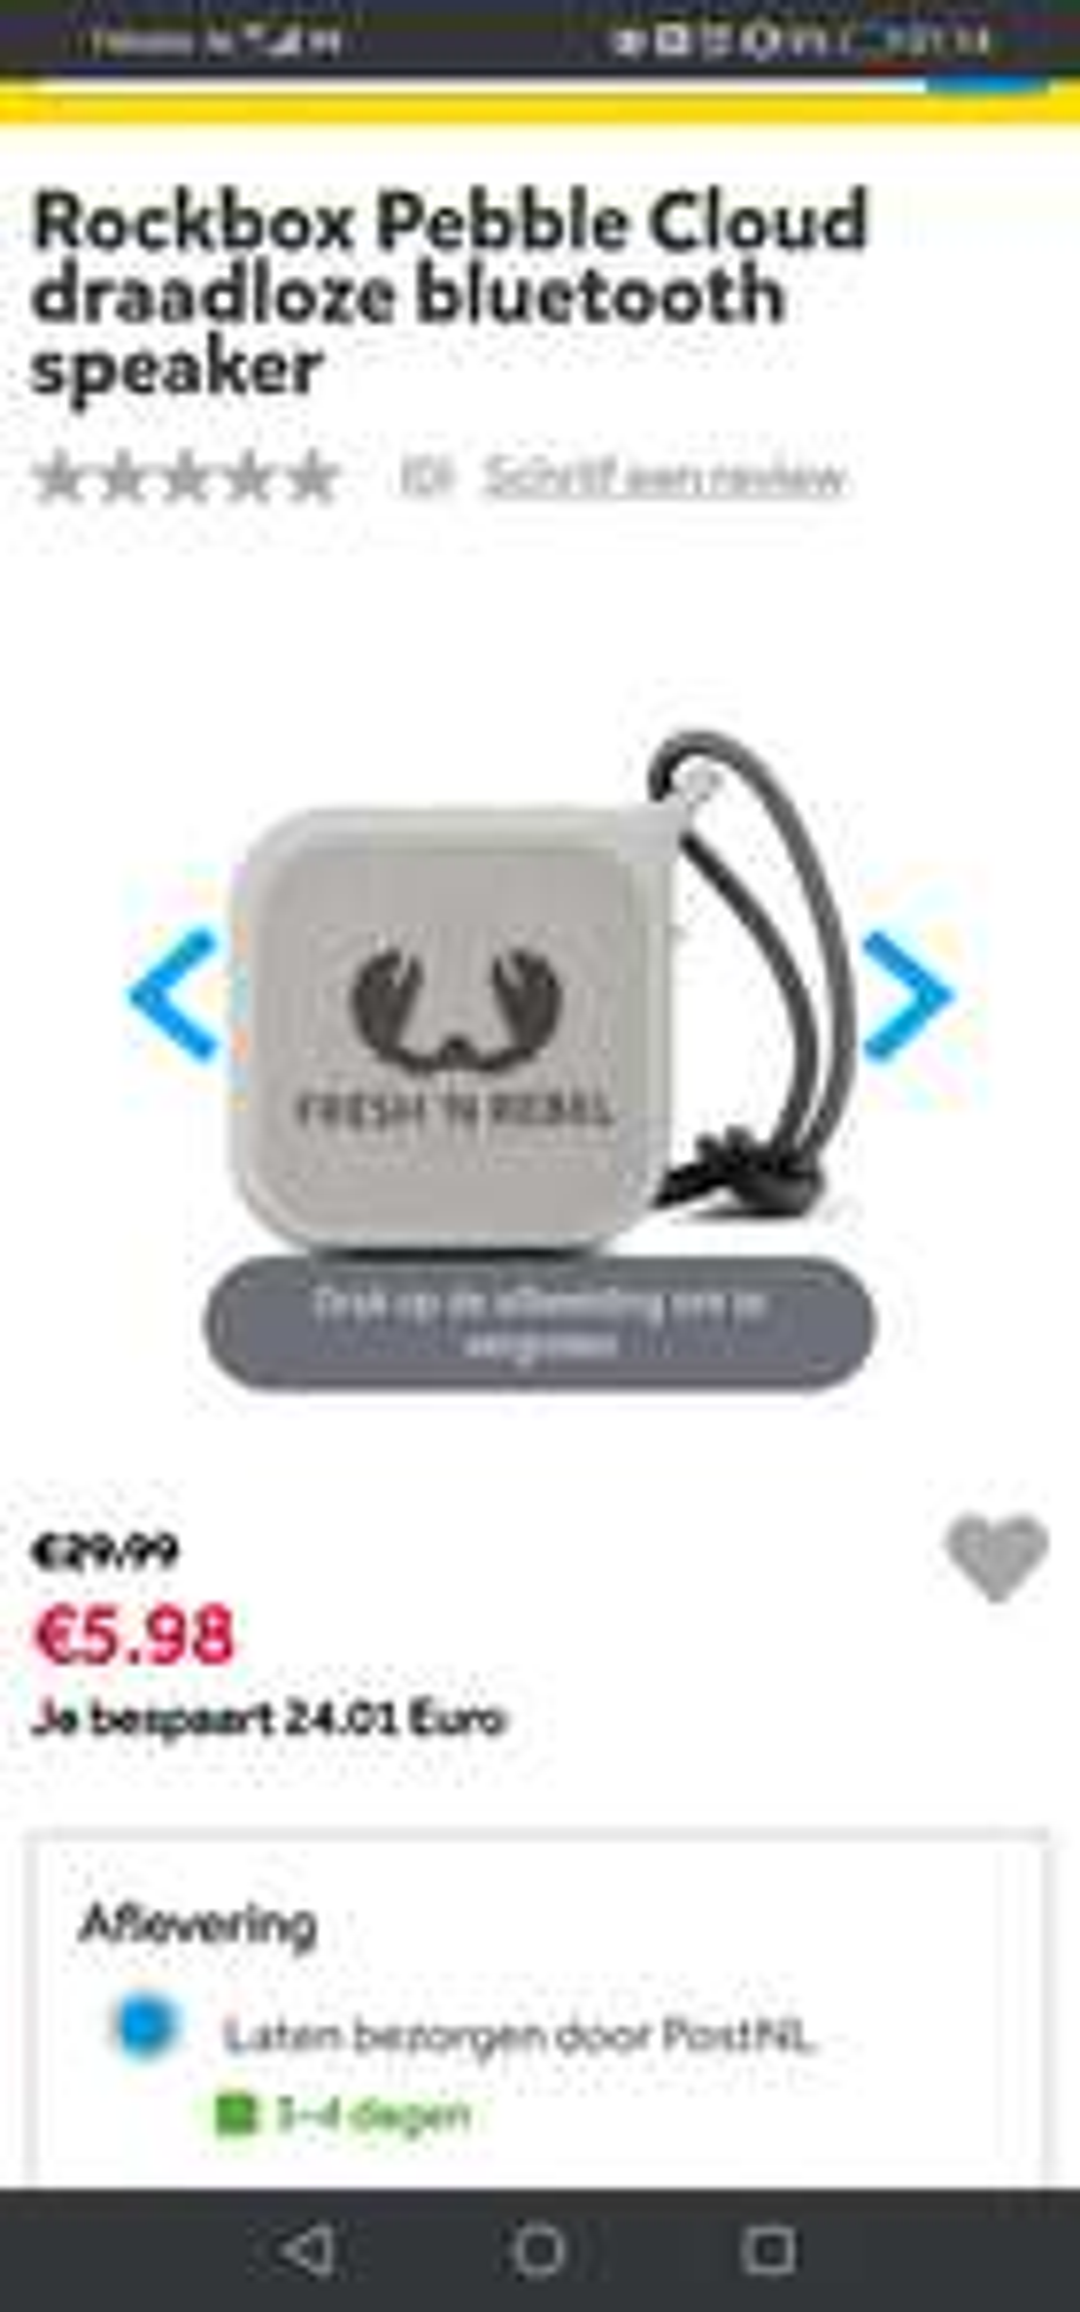 (Intertoys) Fresh 'n Rebel Rockbox Pebble Cloud draadloze bluetooth speaker